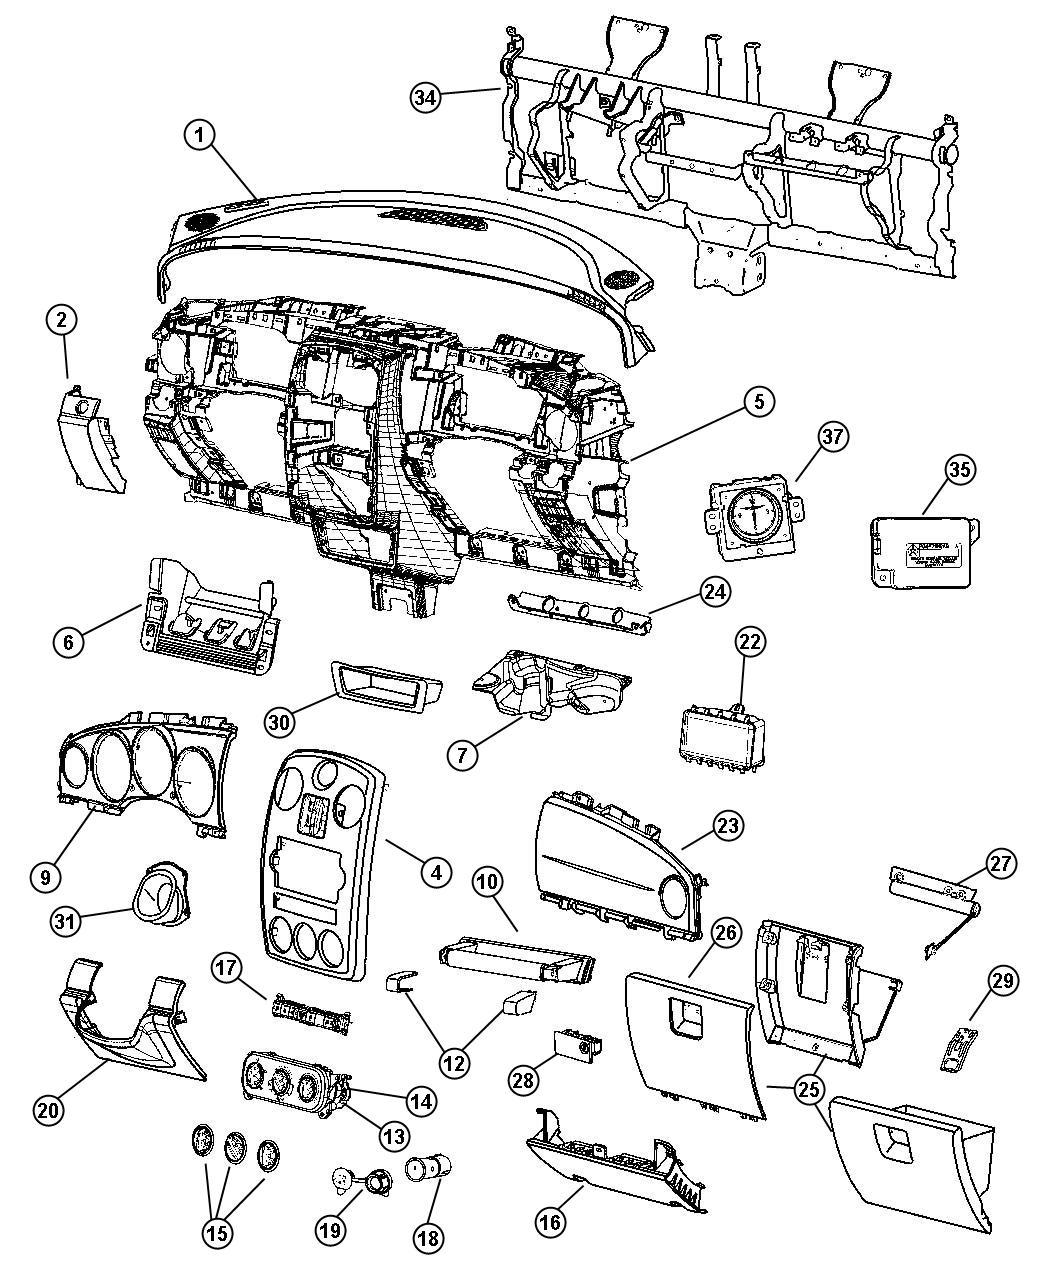 Chrysler Pt Cruiser Door. Glove box. [ka]. Trim: [all trim